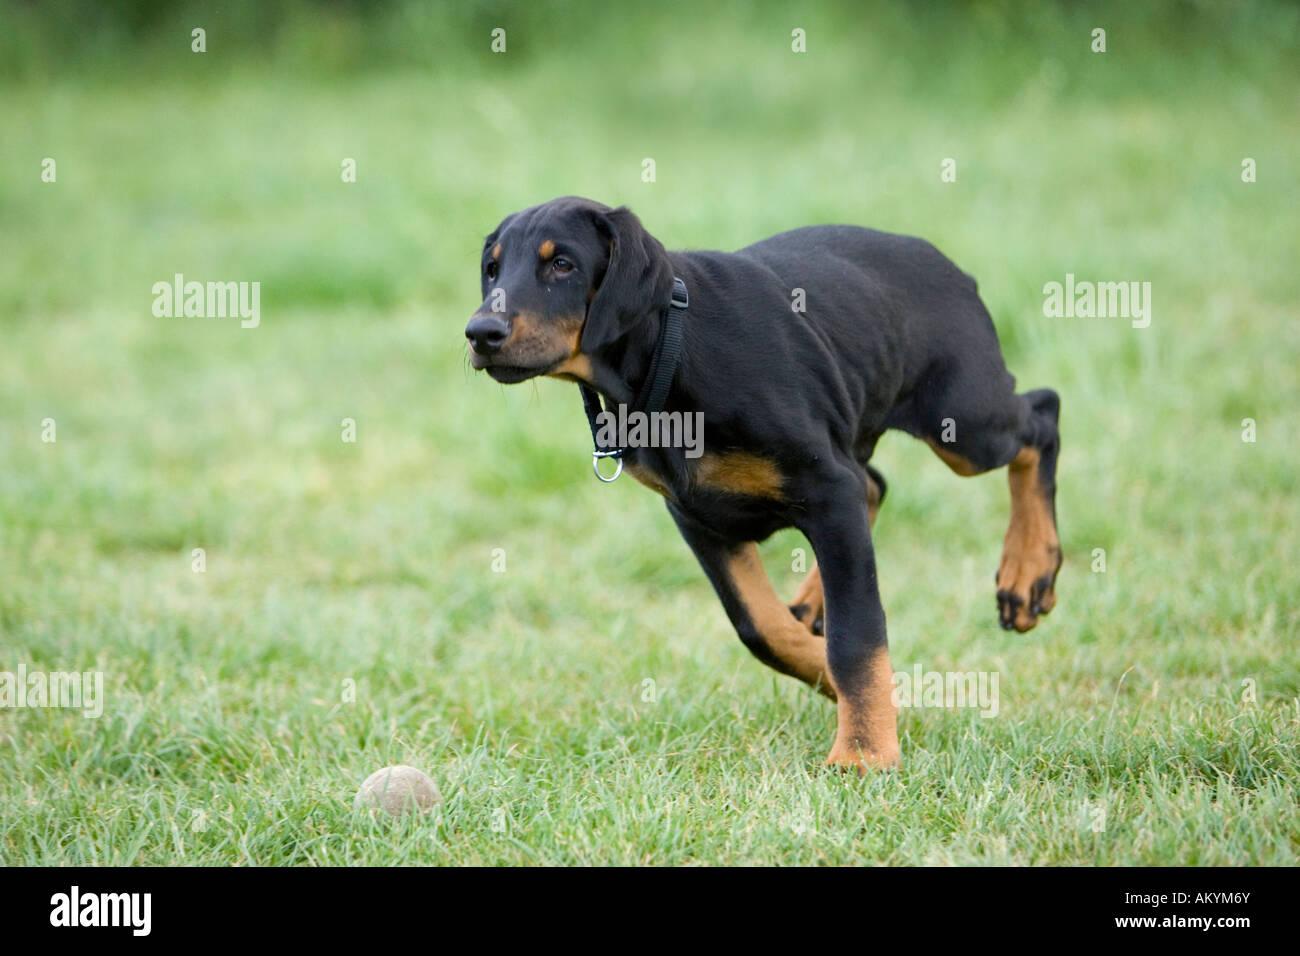 Young Doberman Pinscher - Stock Image